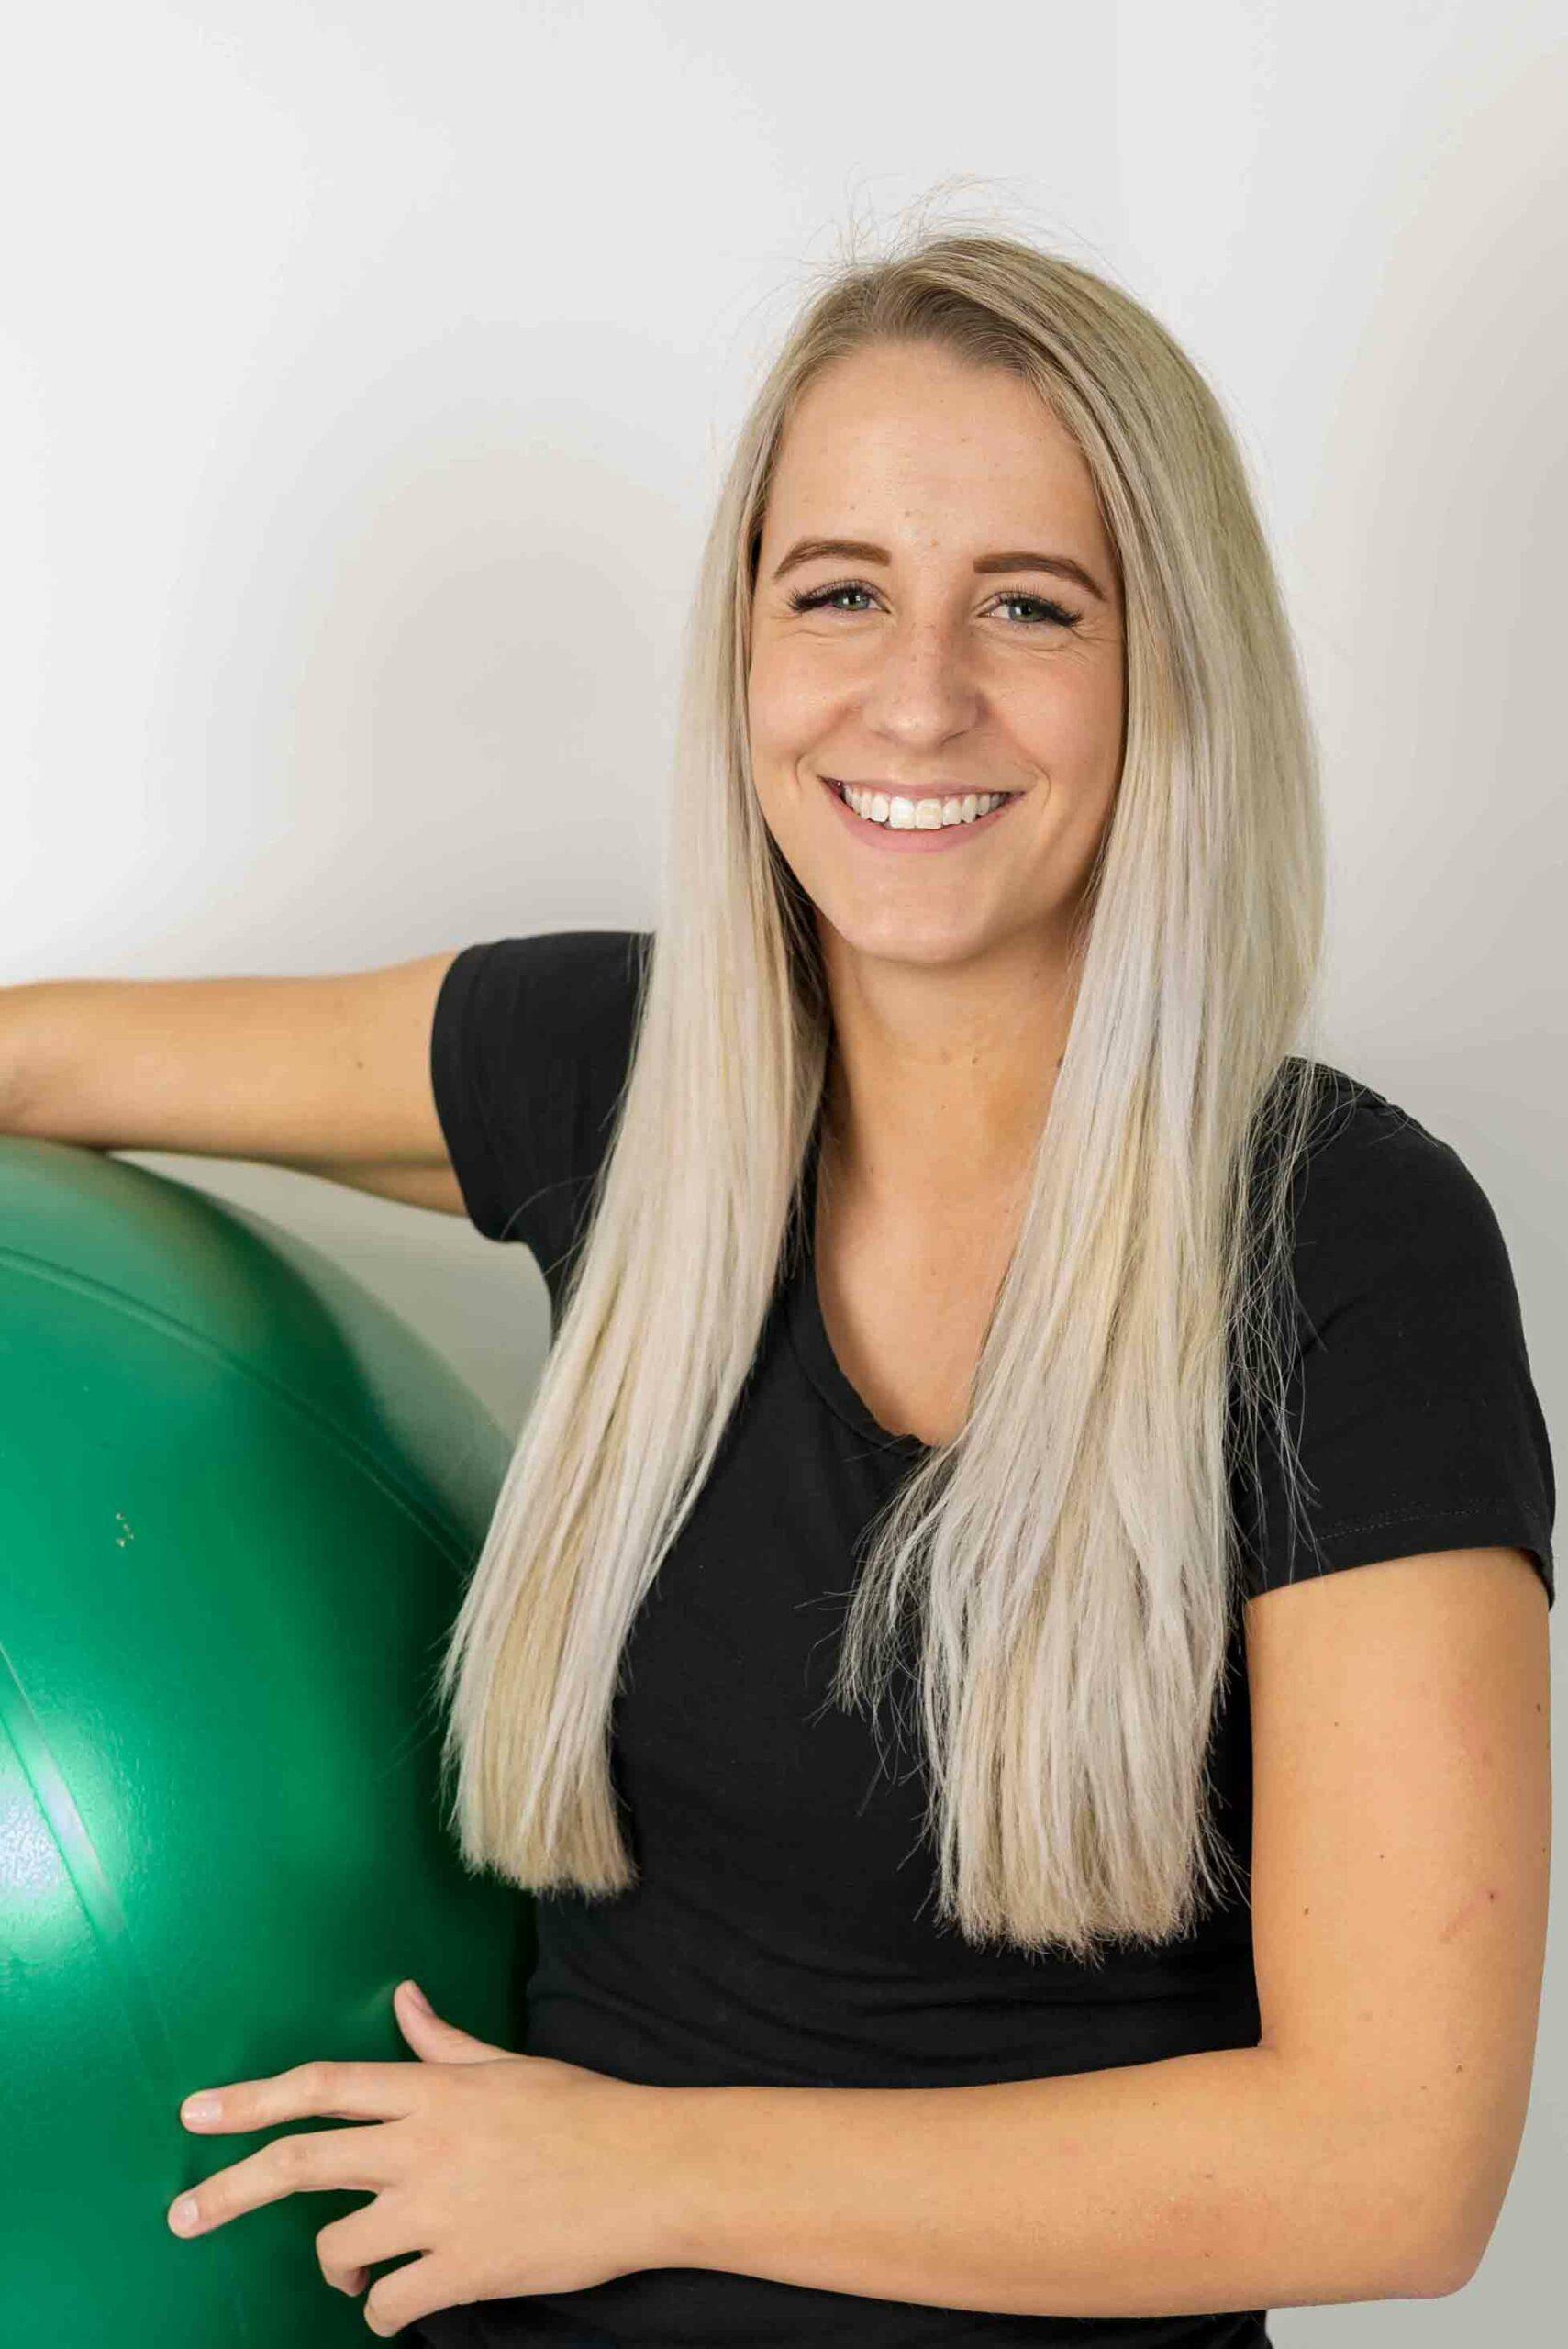 Melissa Bongen - Physiotherapie Physio Plus GbR Inden